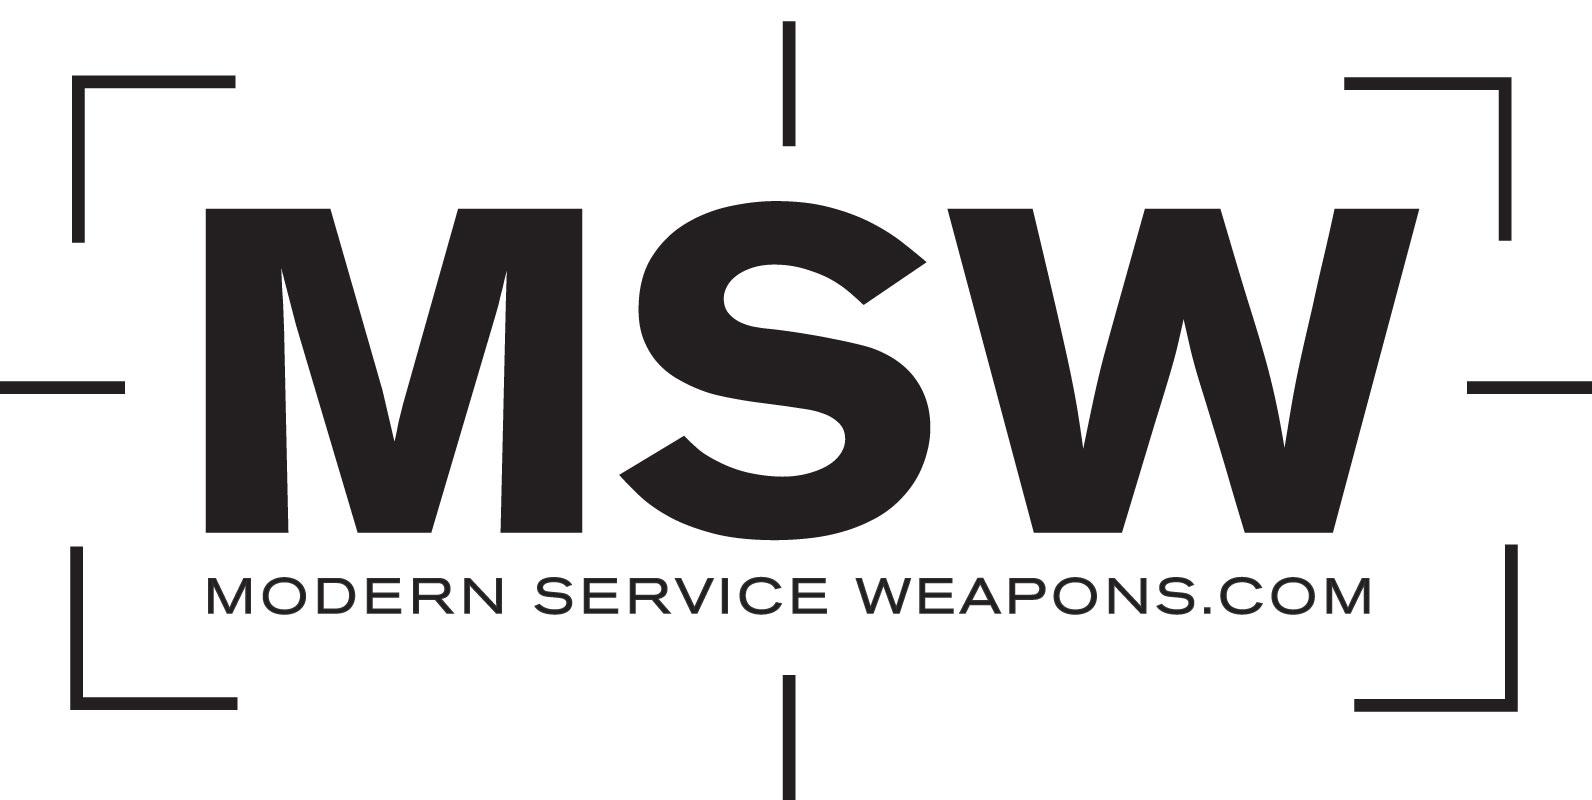 msw-logo-url-black-800x1592.jpg